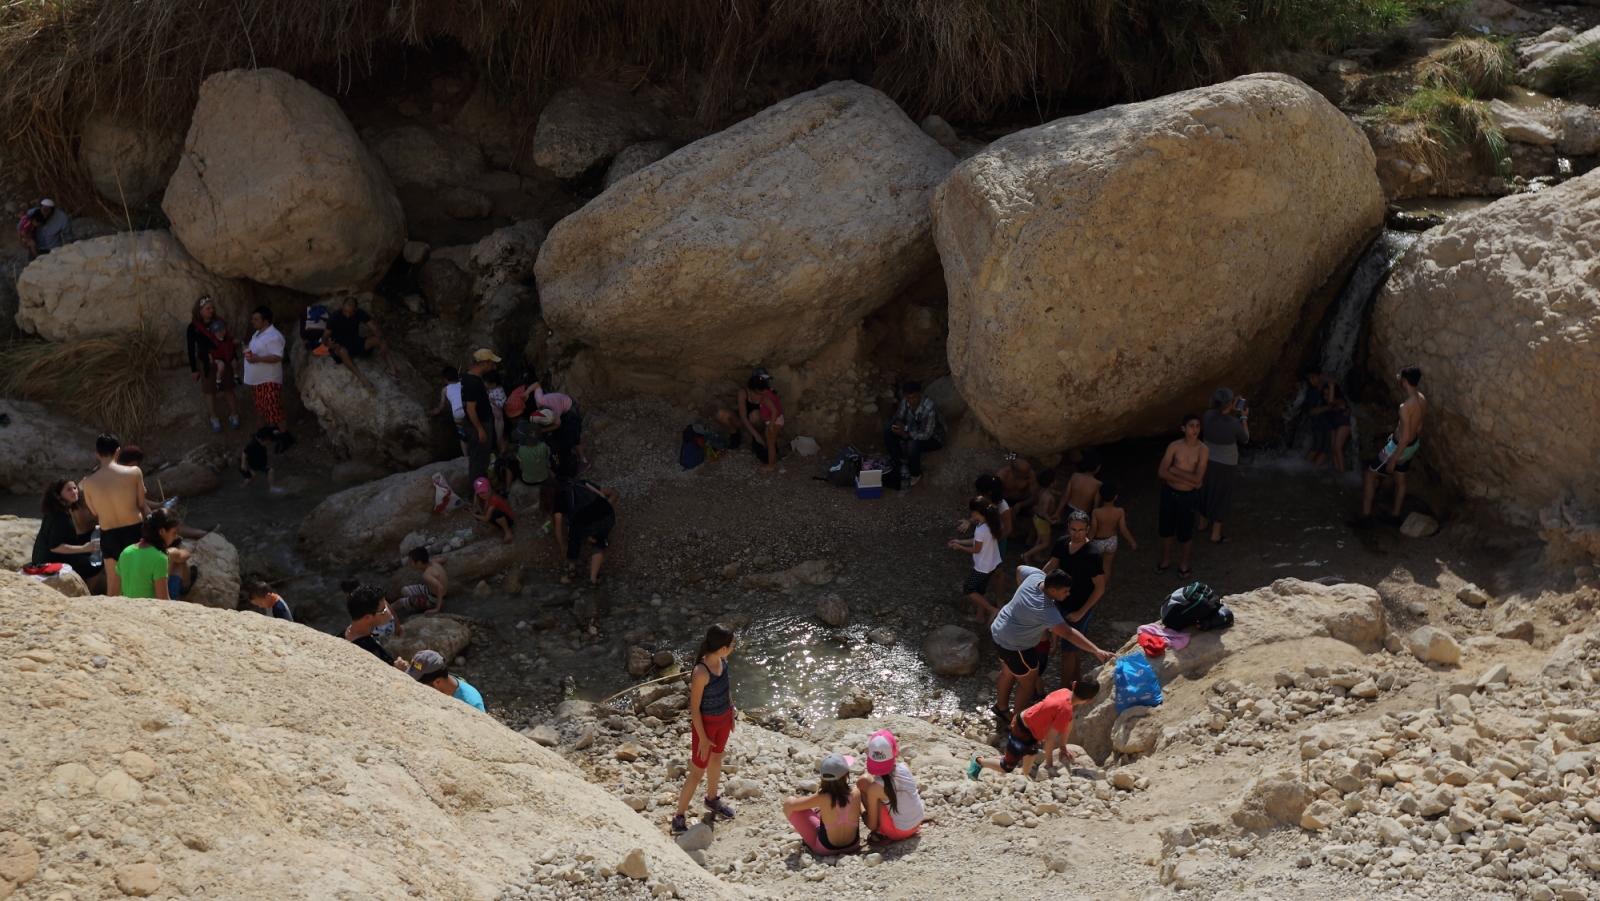 Hikers in Nahal David. Photo by Yaakov Naumi/Flash90